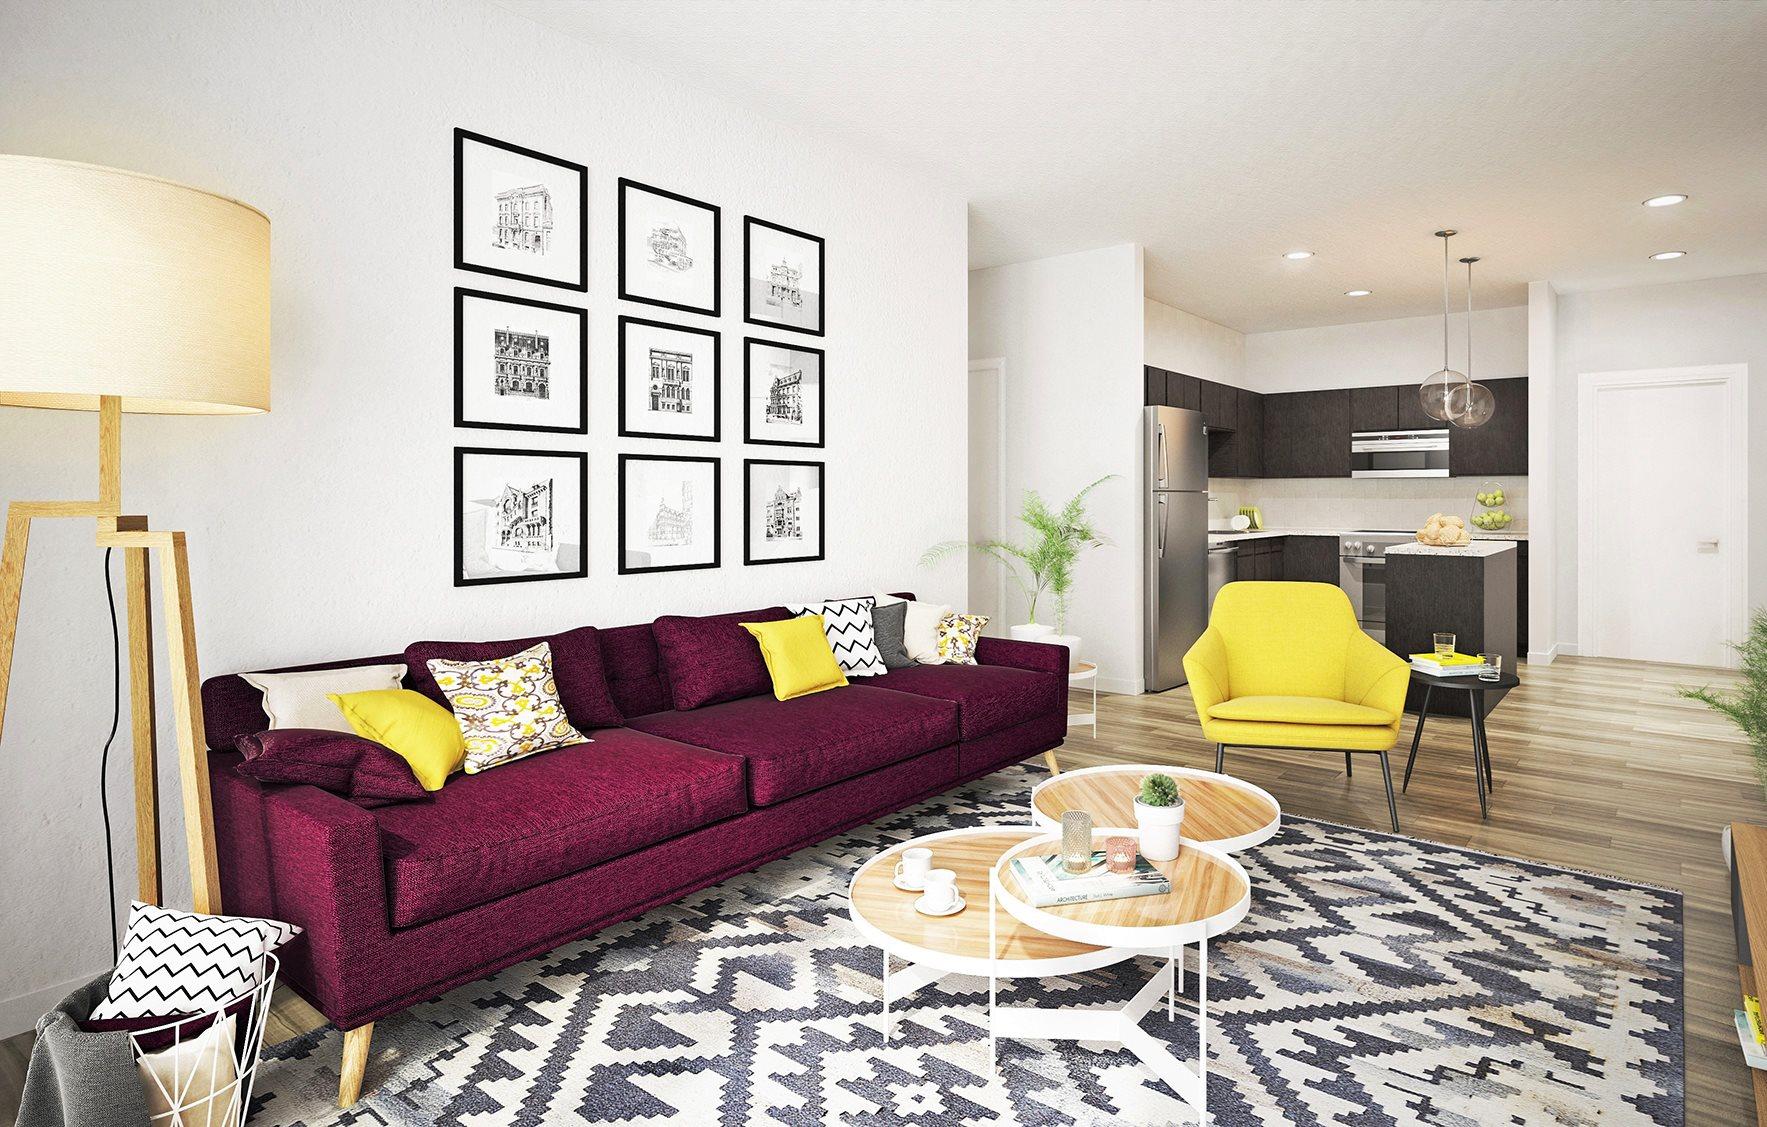 Living Room at Soll Apartments Des Moines IA